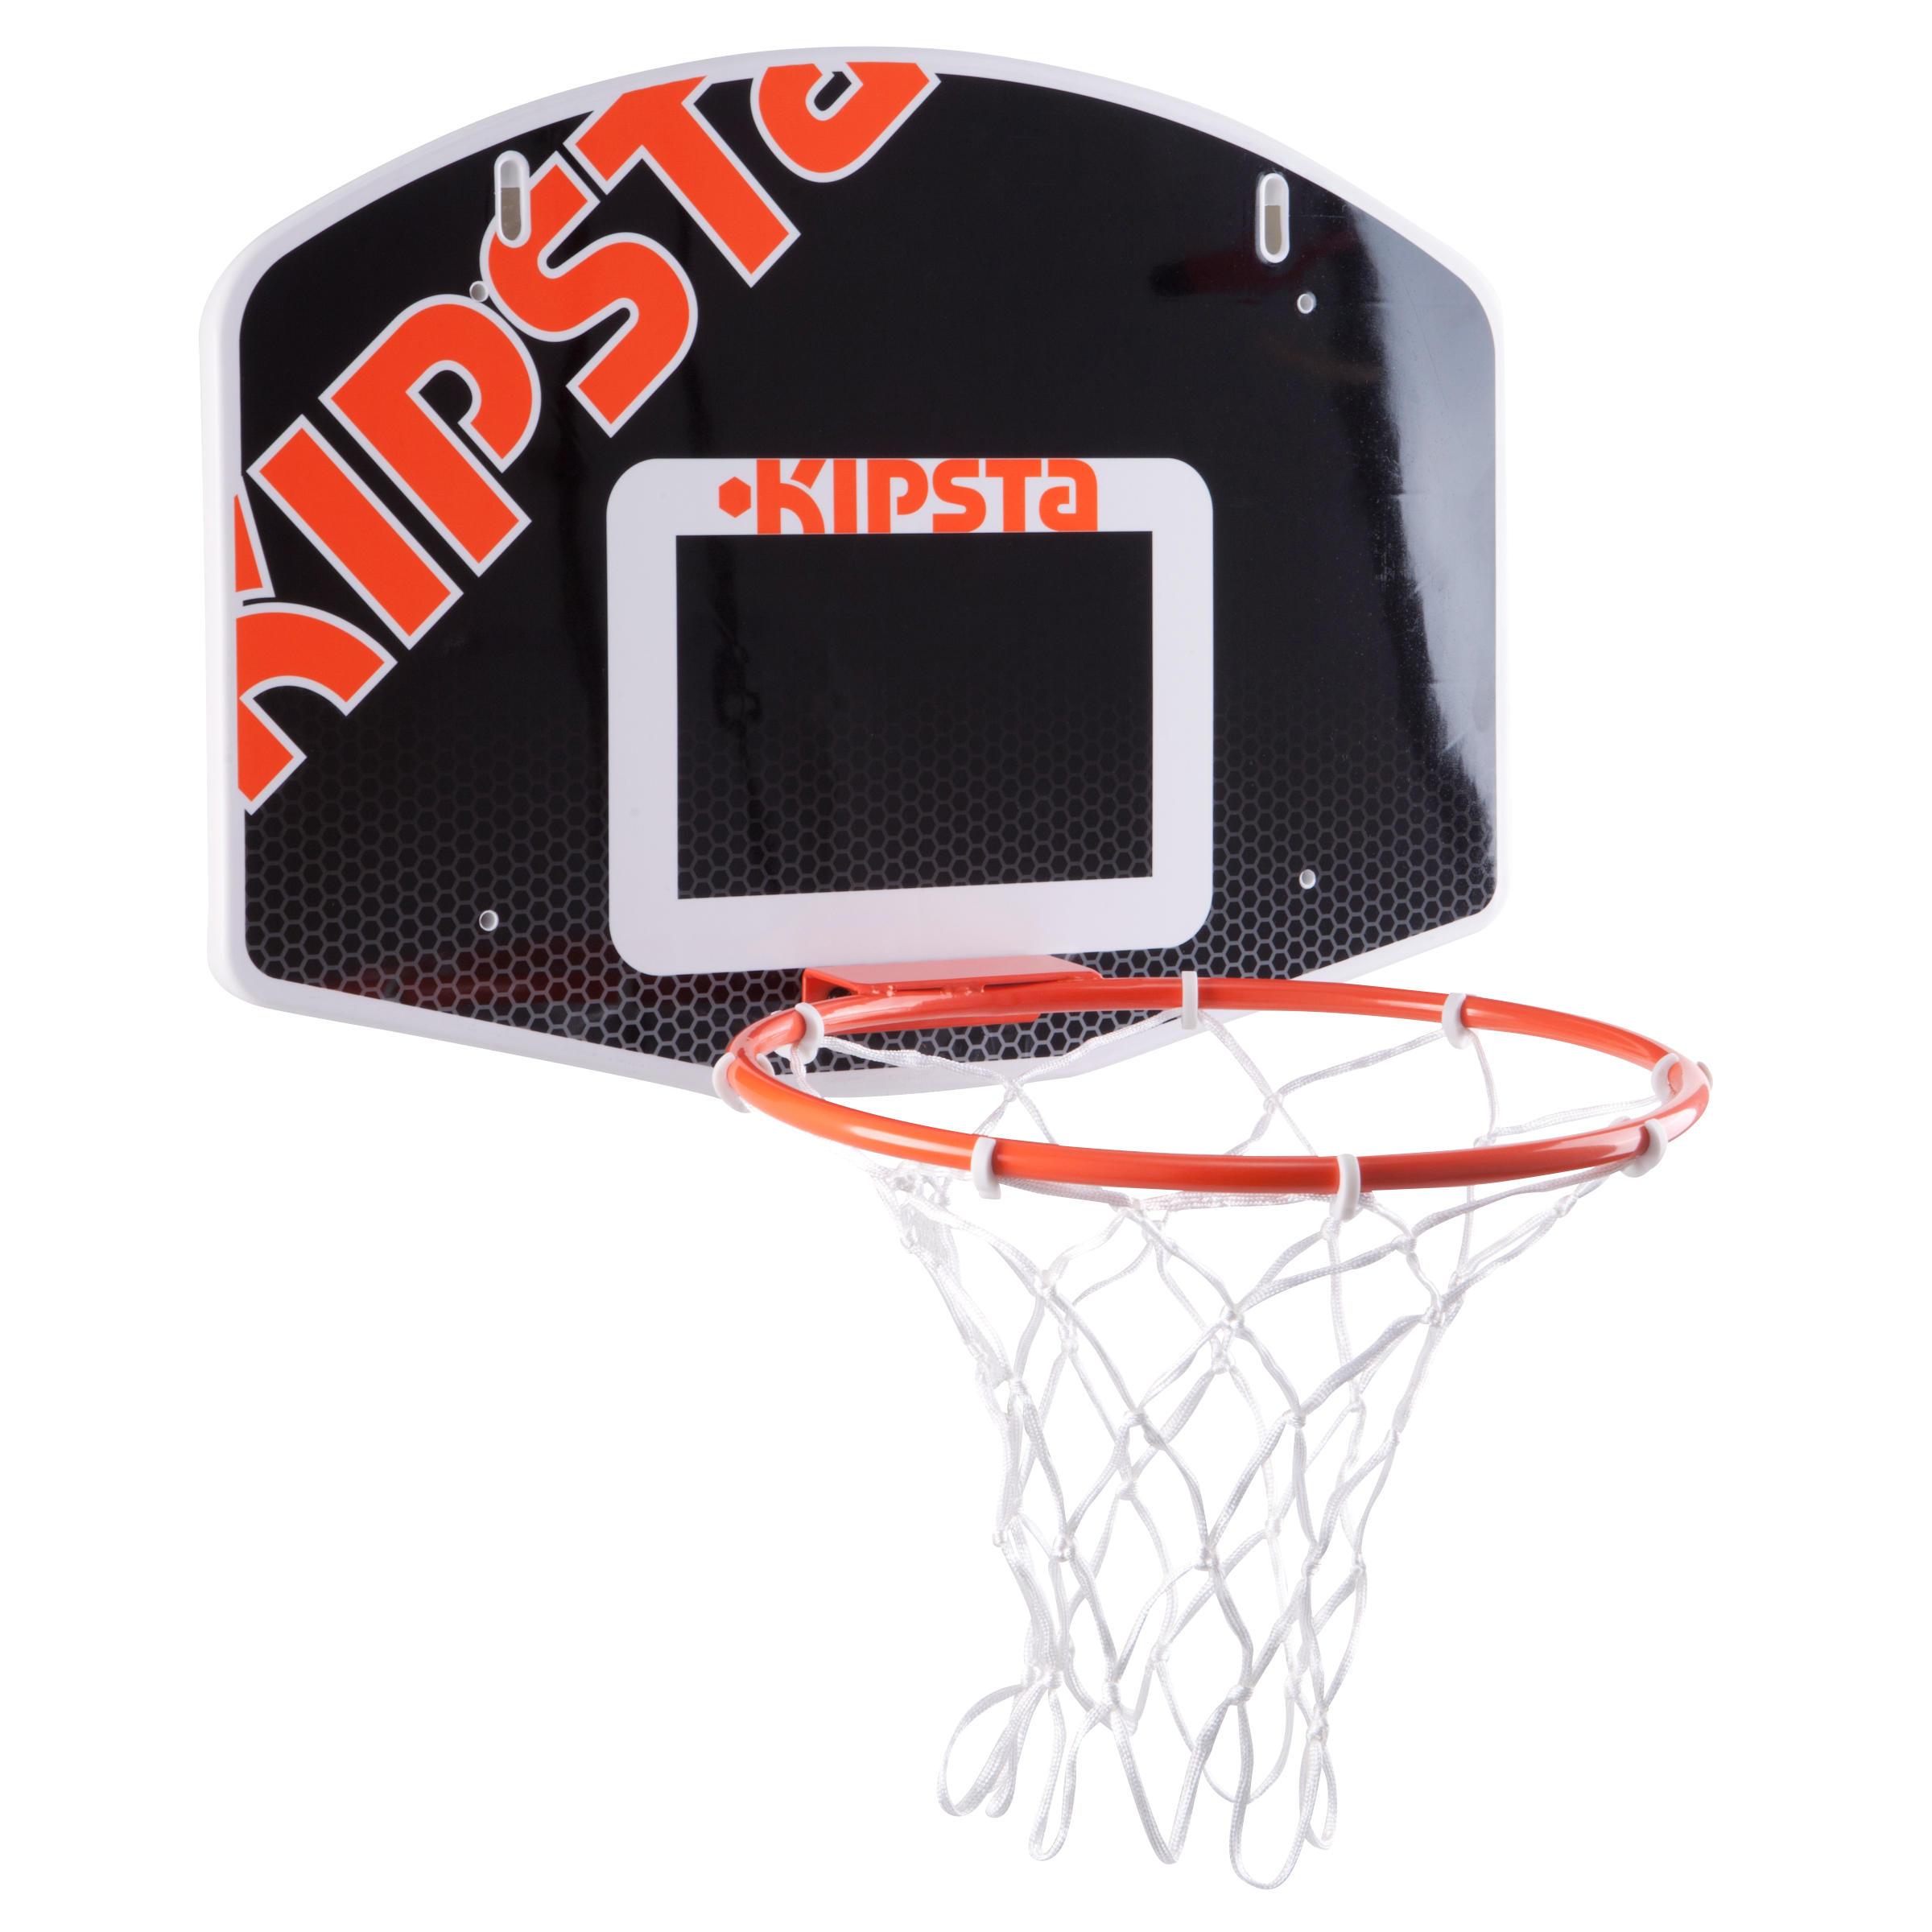 Tarmak Basketbalbord B100 (tot 8 jaar)